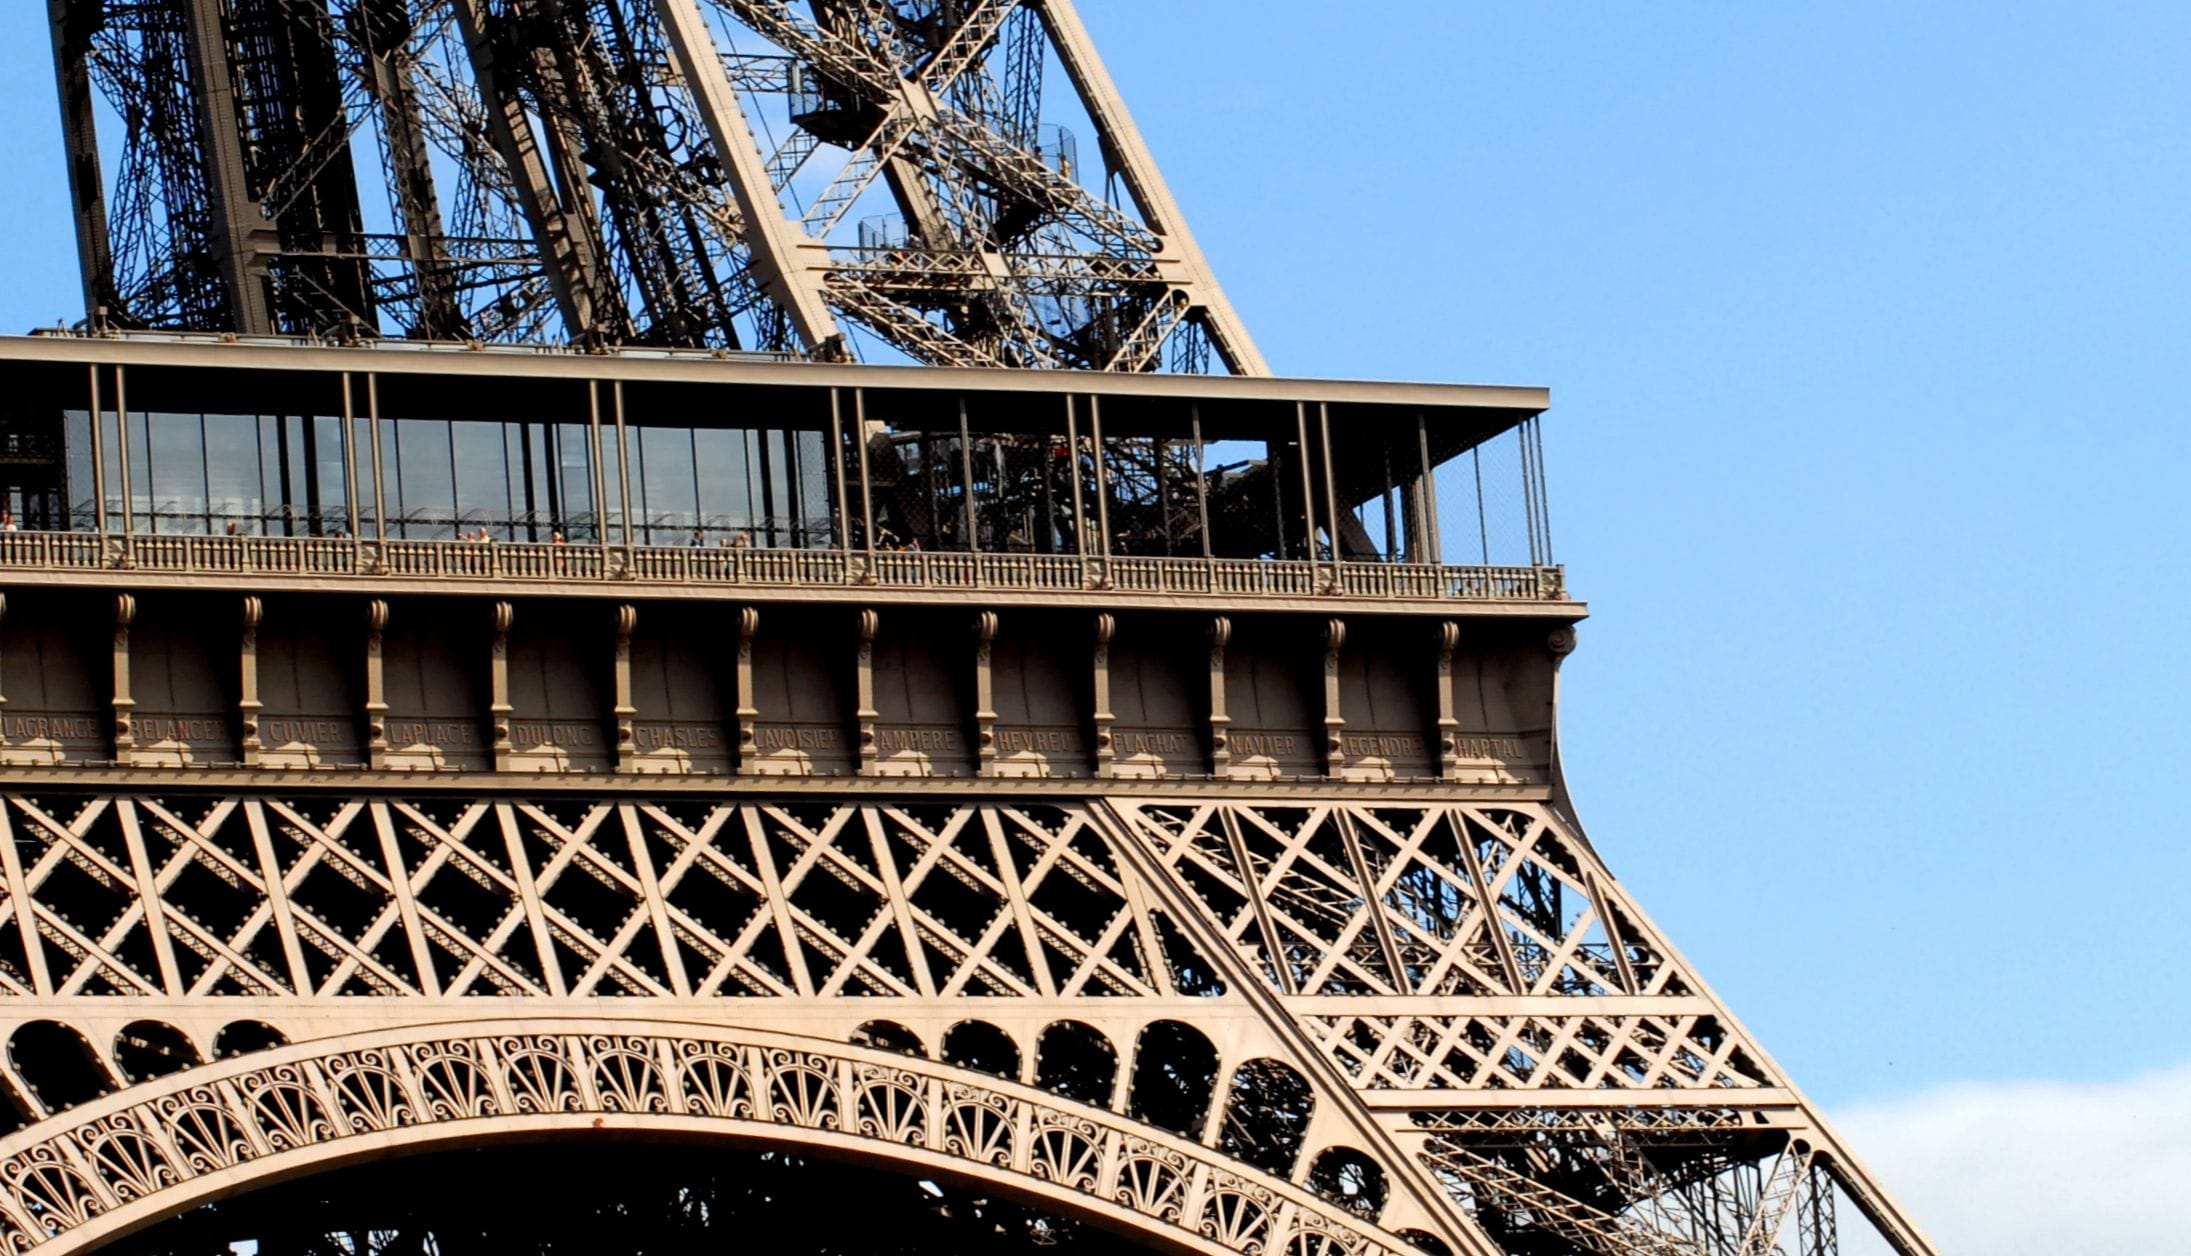 Eiffel Tower Zoom